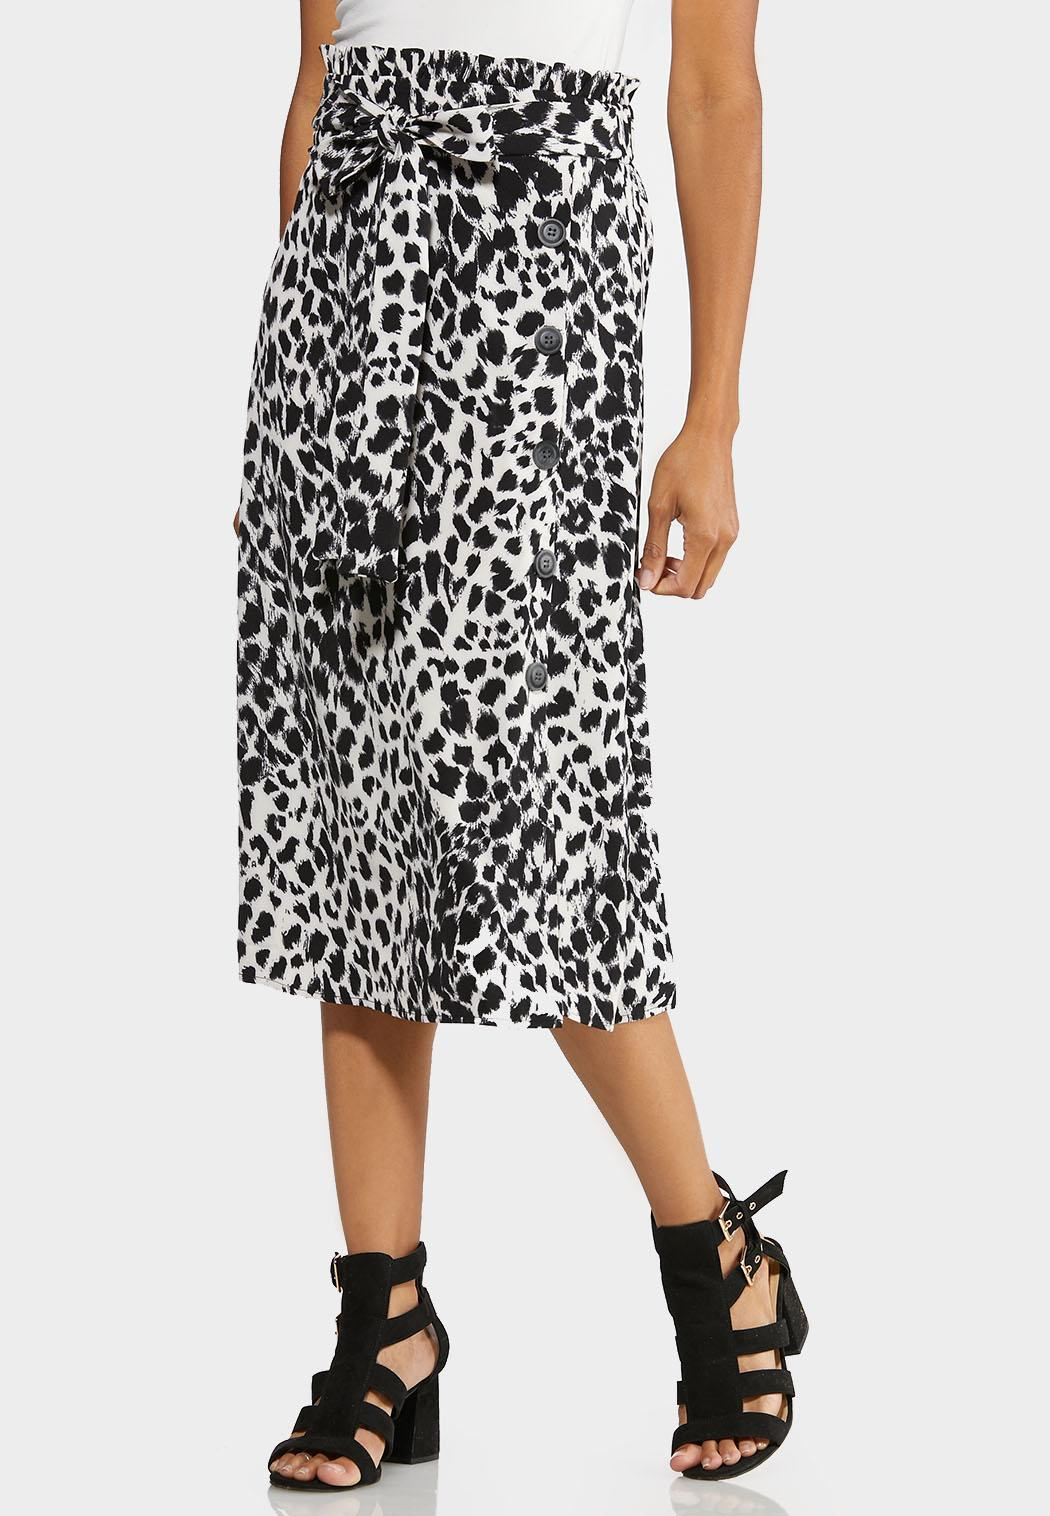 Plus Size Black White Leopard Midi Skirt